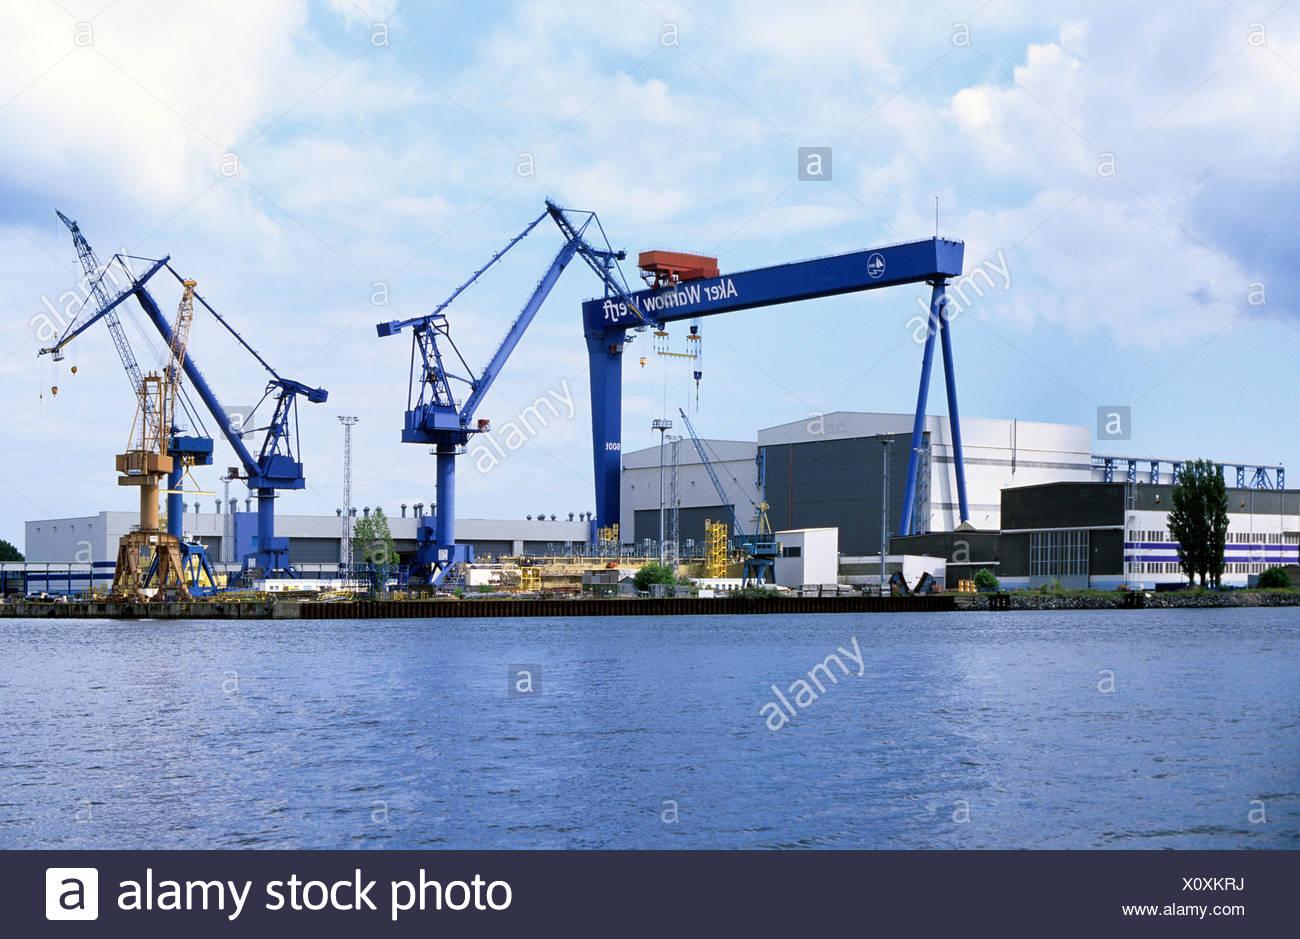 Shipyard, Aker Warnow shipyard, Mecklenburg-Western Pomerania, Germany Europe - Stock Image